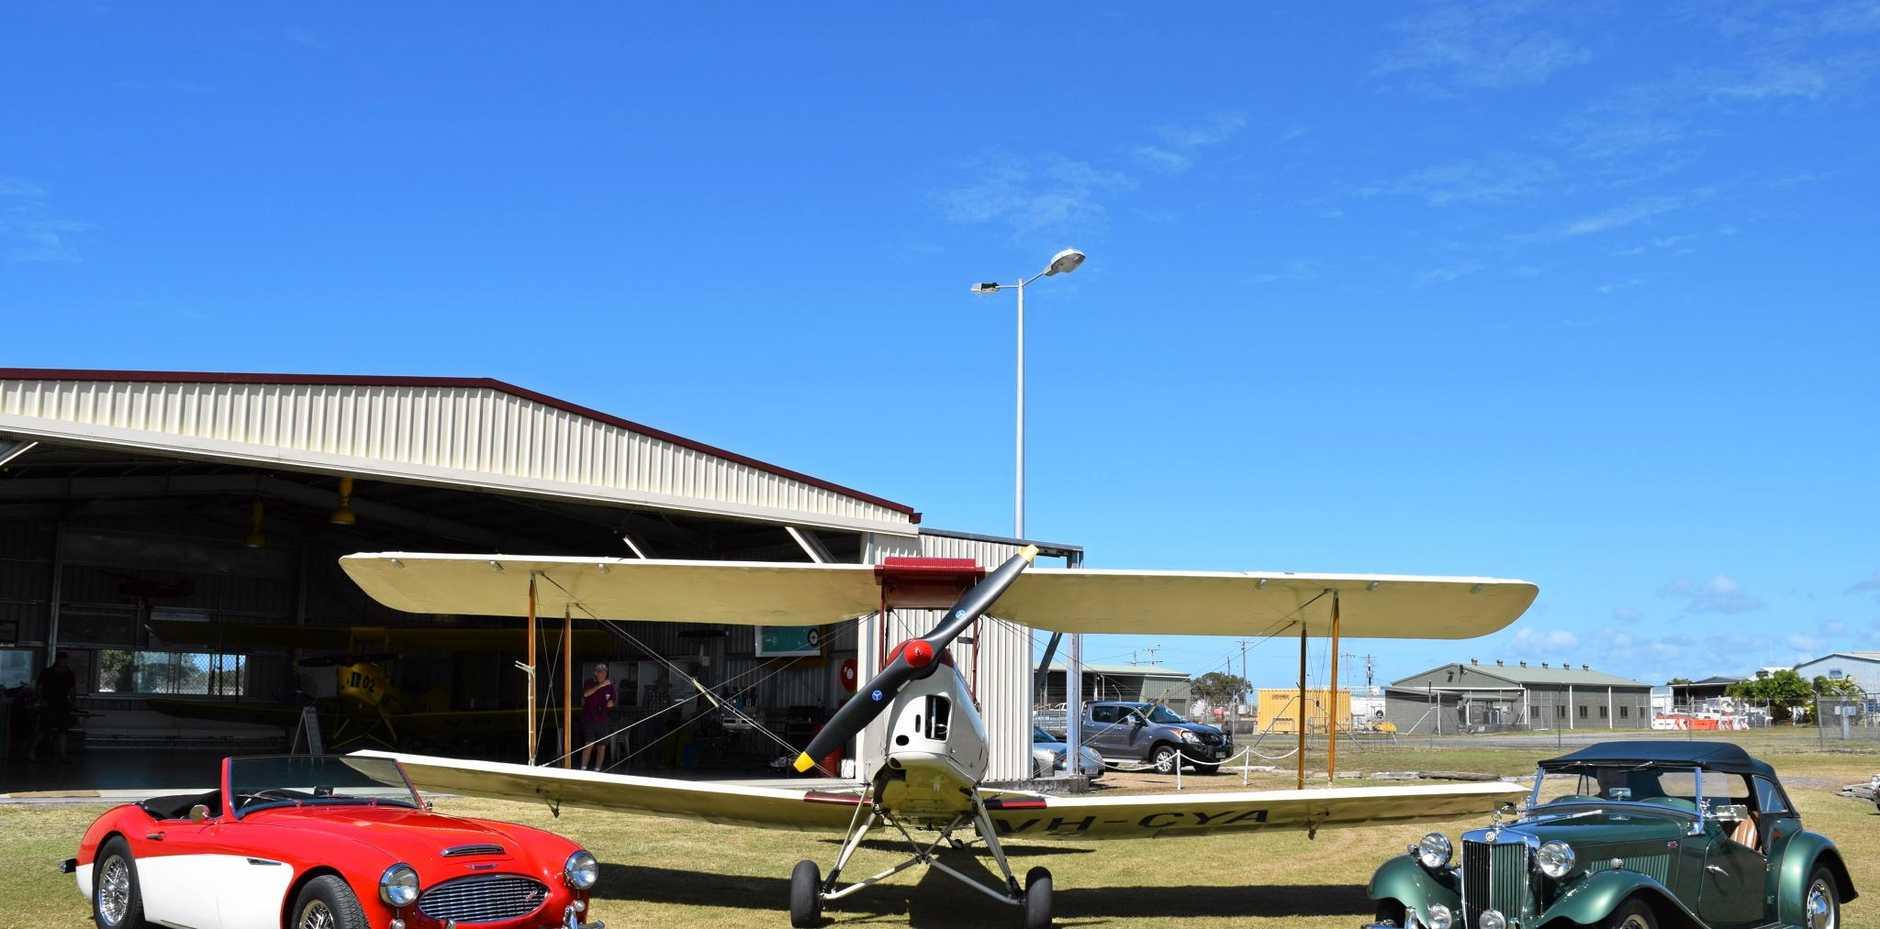 Classis MGs on display at the Mackay Aero Club.